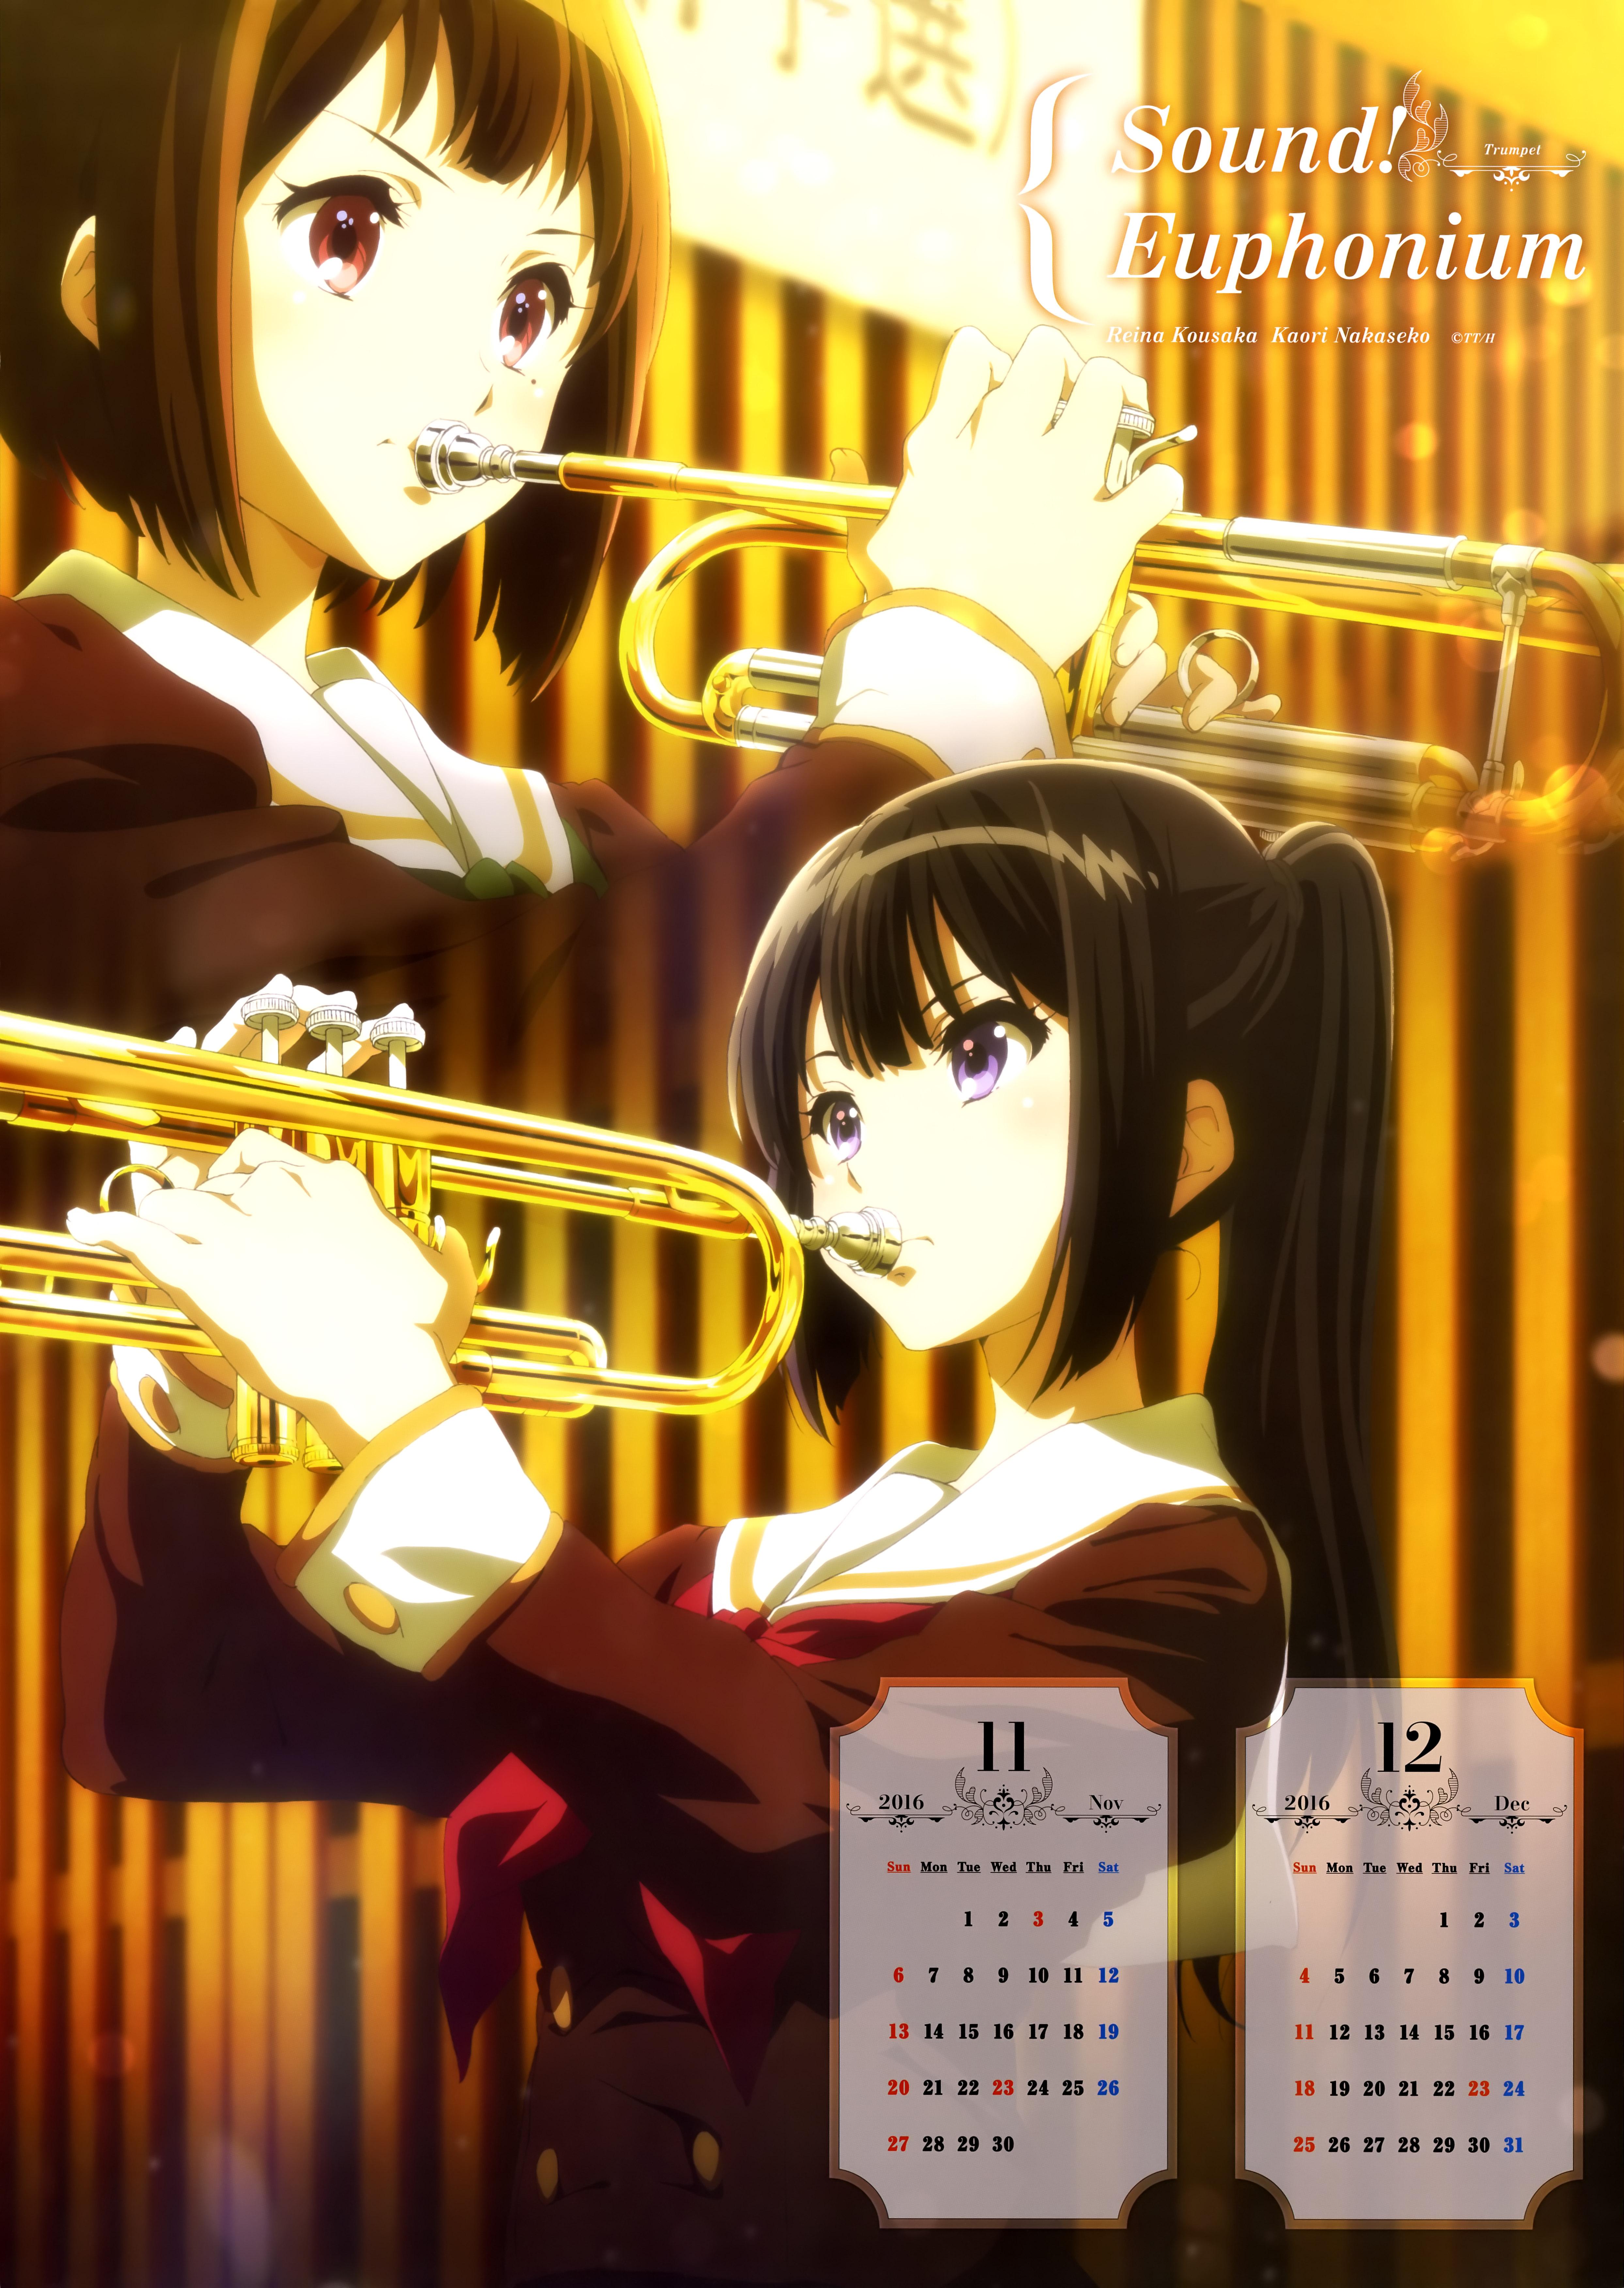 Hibike! Euphonium Anime calendar 2016 0006